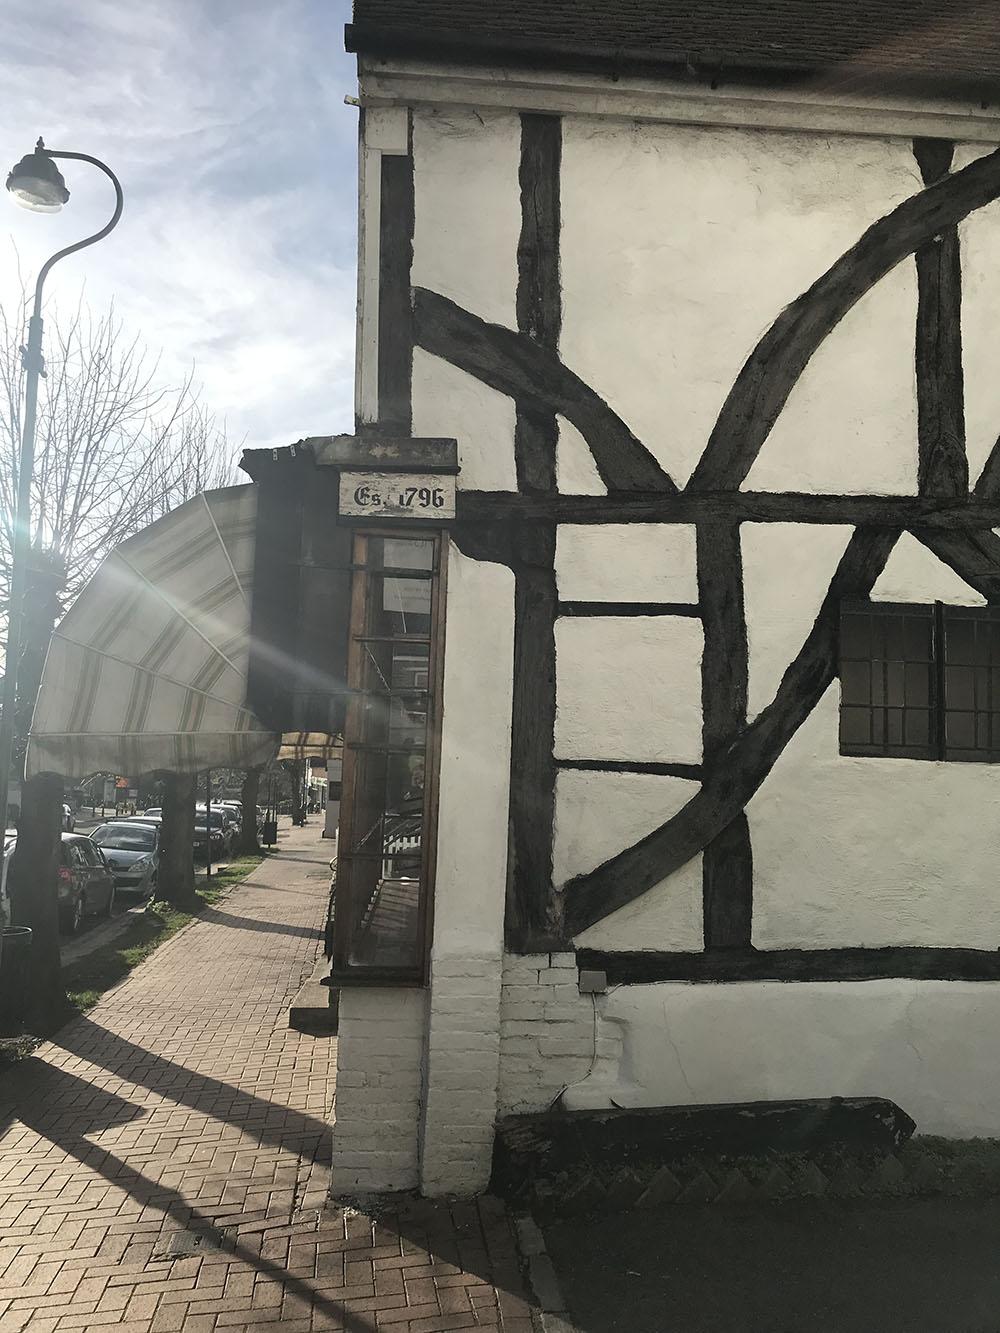 4 - Humphrey's Bakery, Lindfield